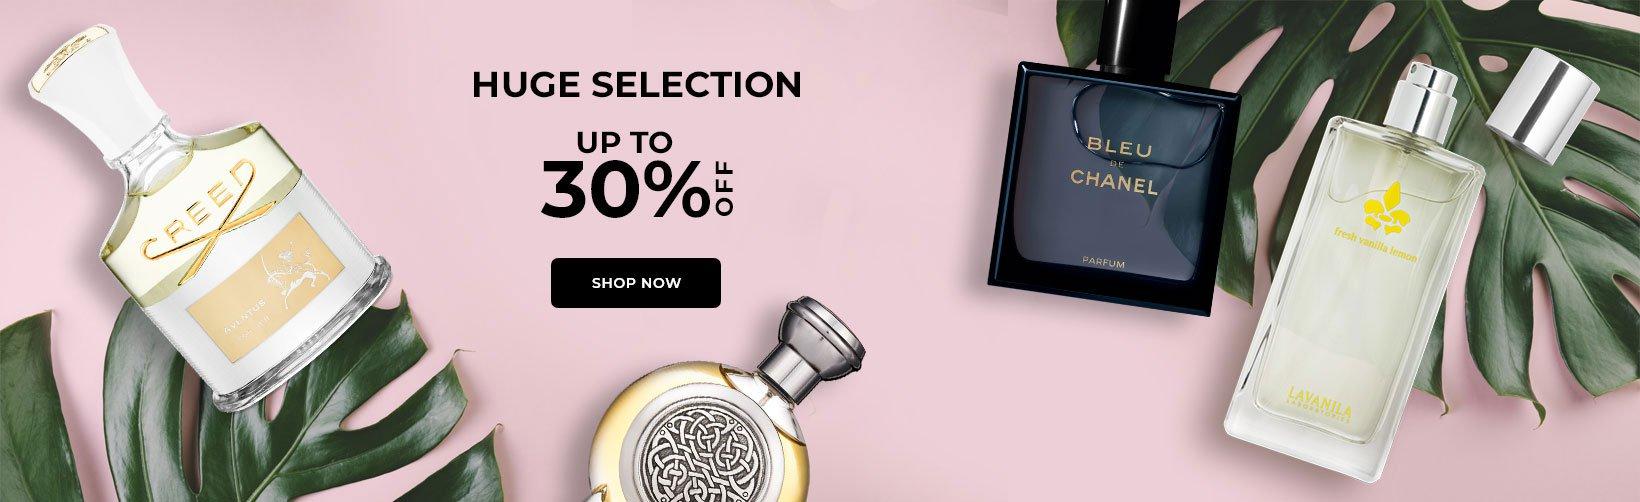 Mini Perfume | FragranceNet.com®